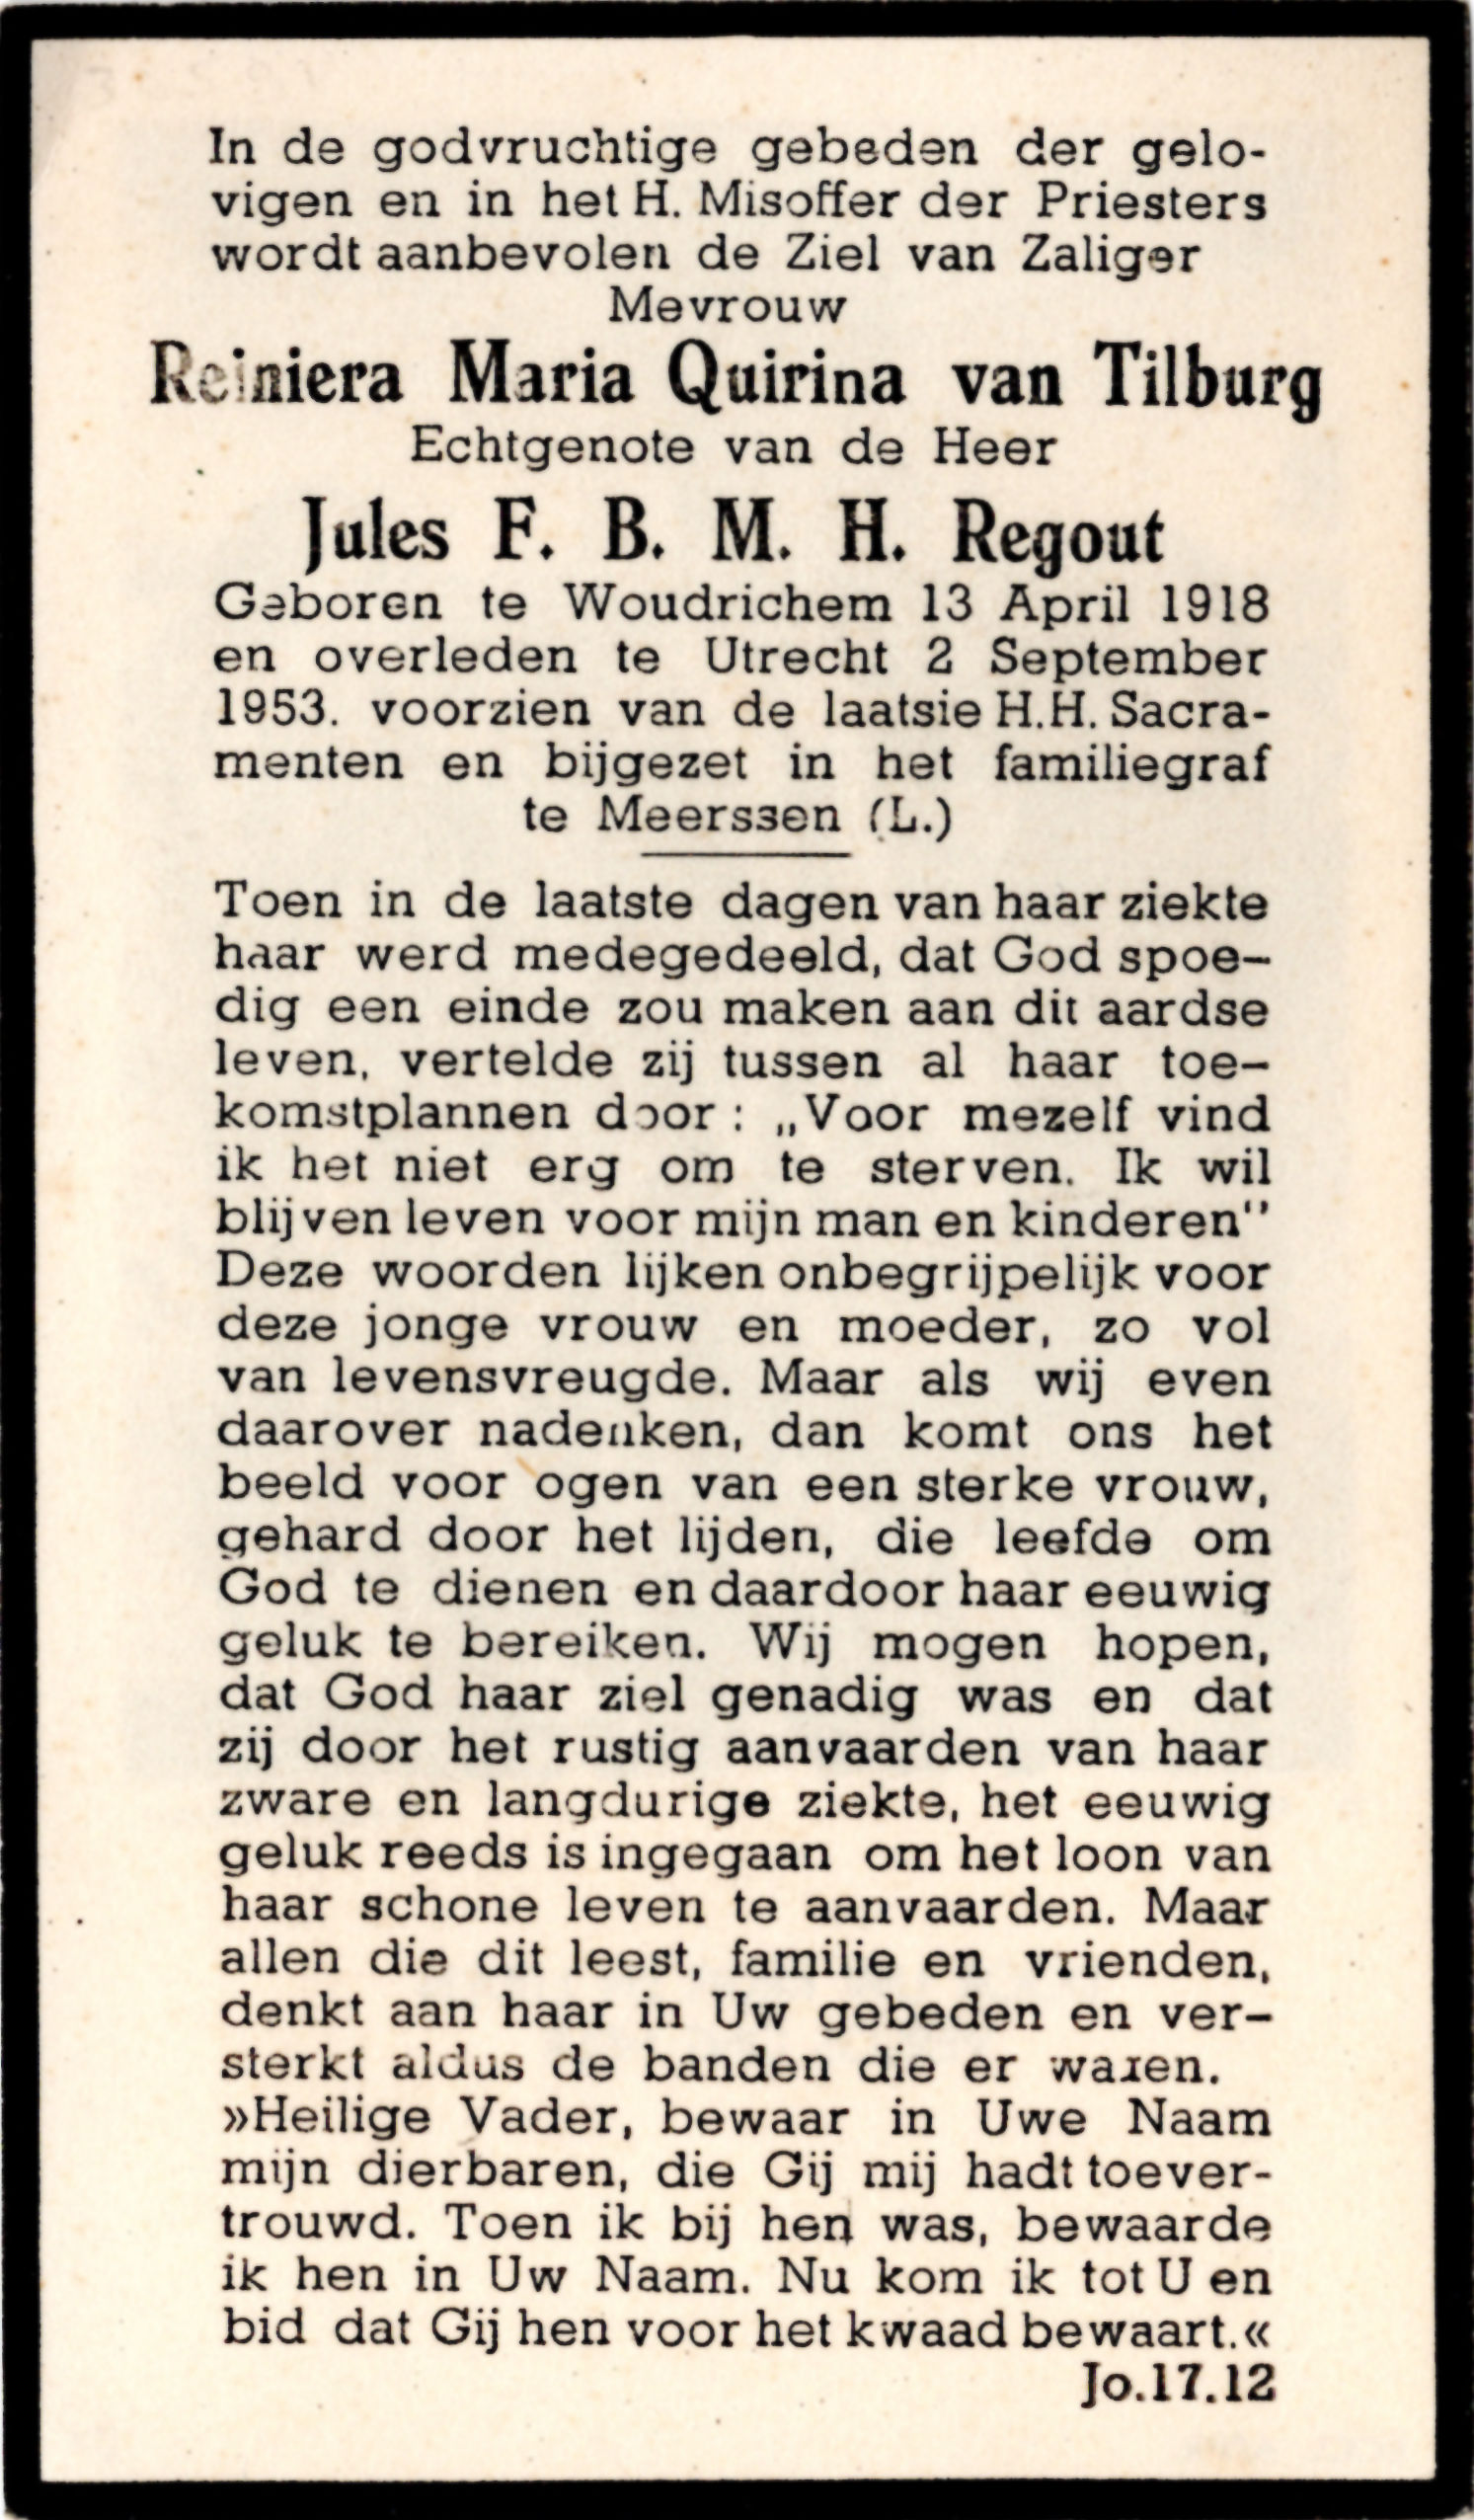 BIDP-026b 1918-Reiniera Maria Quirina van Tilburg